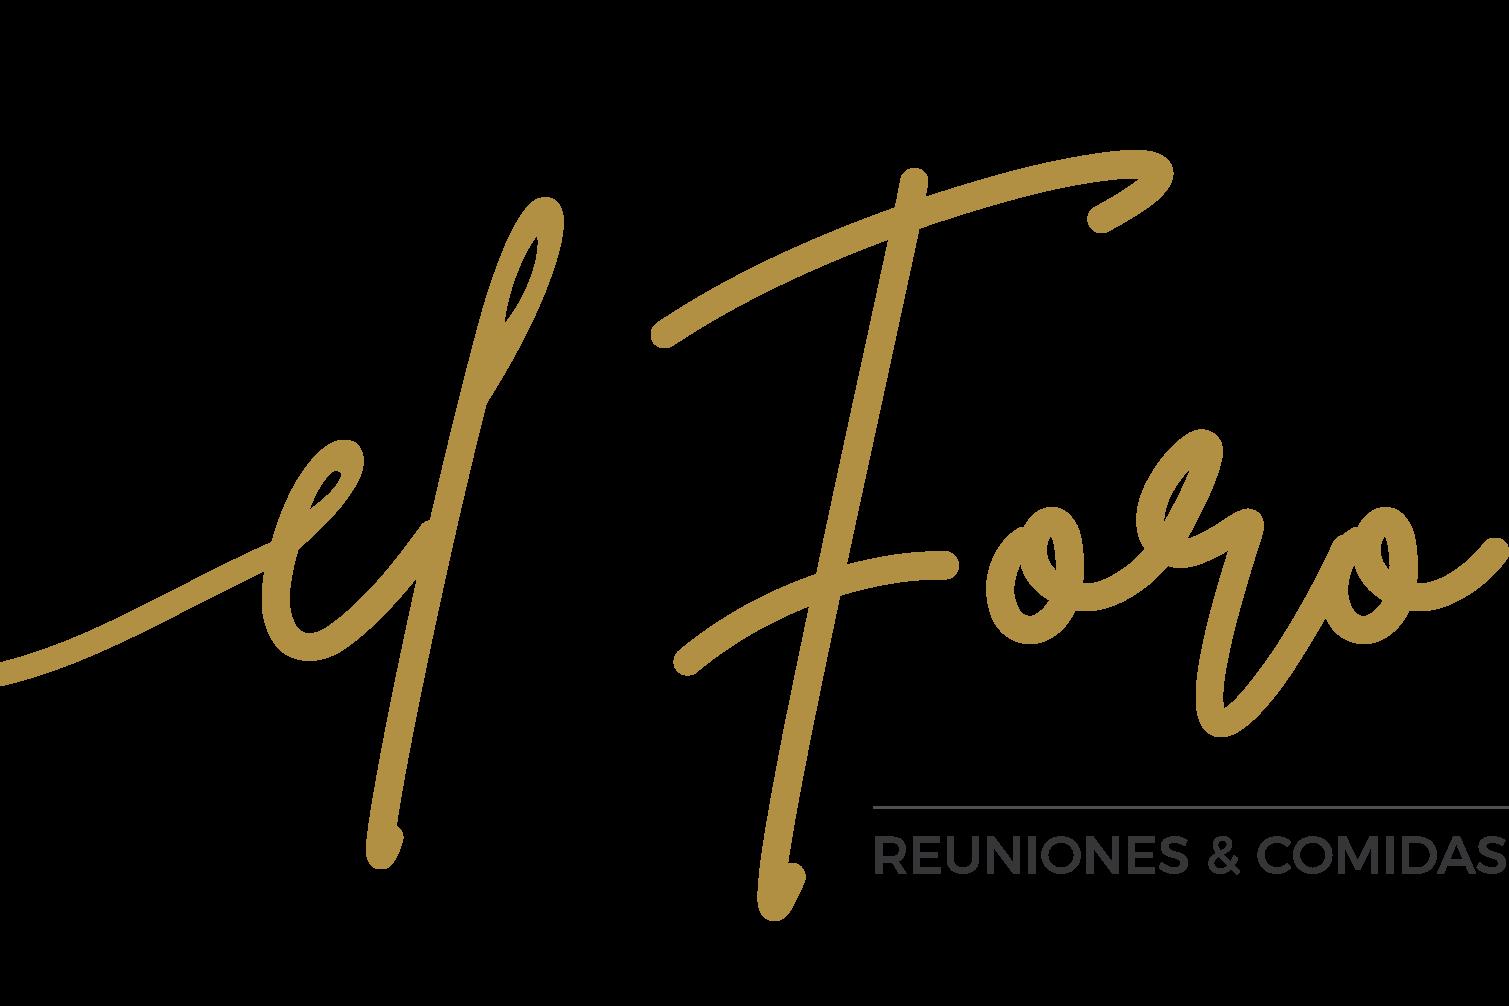 El Foro Ferrol